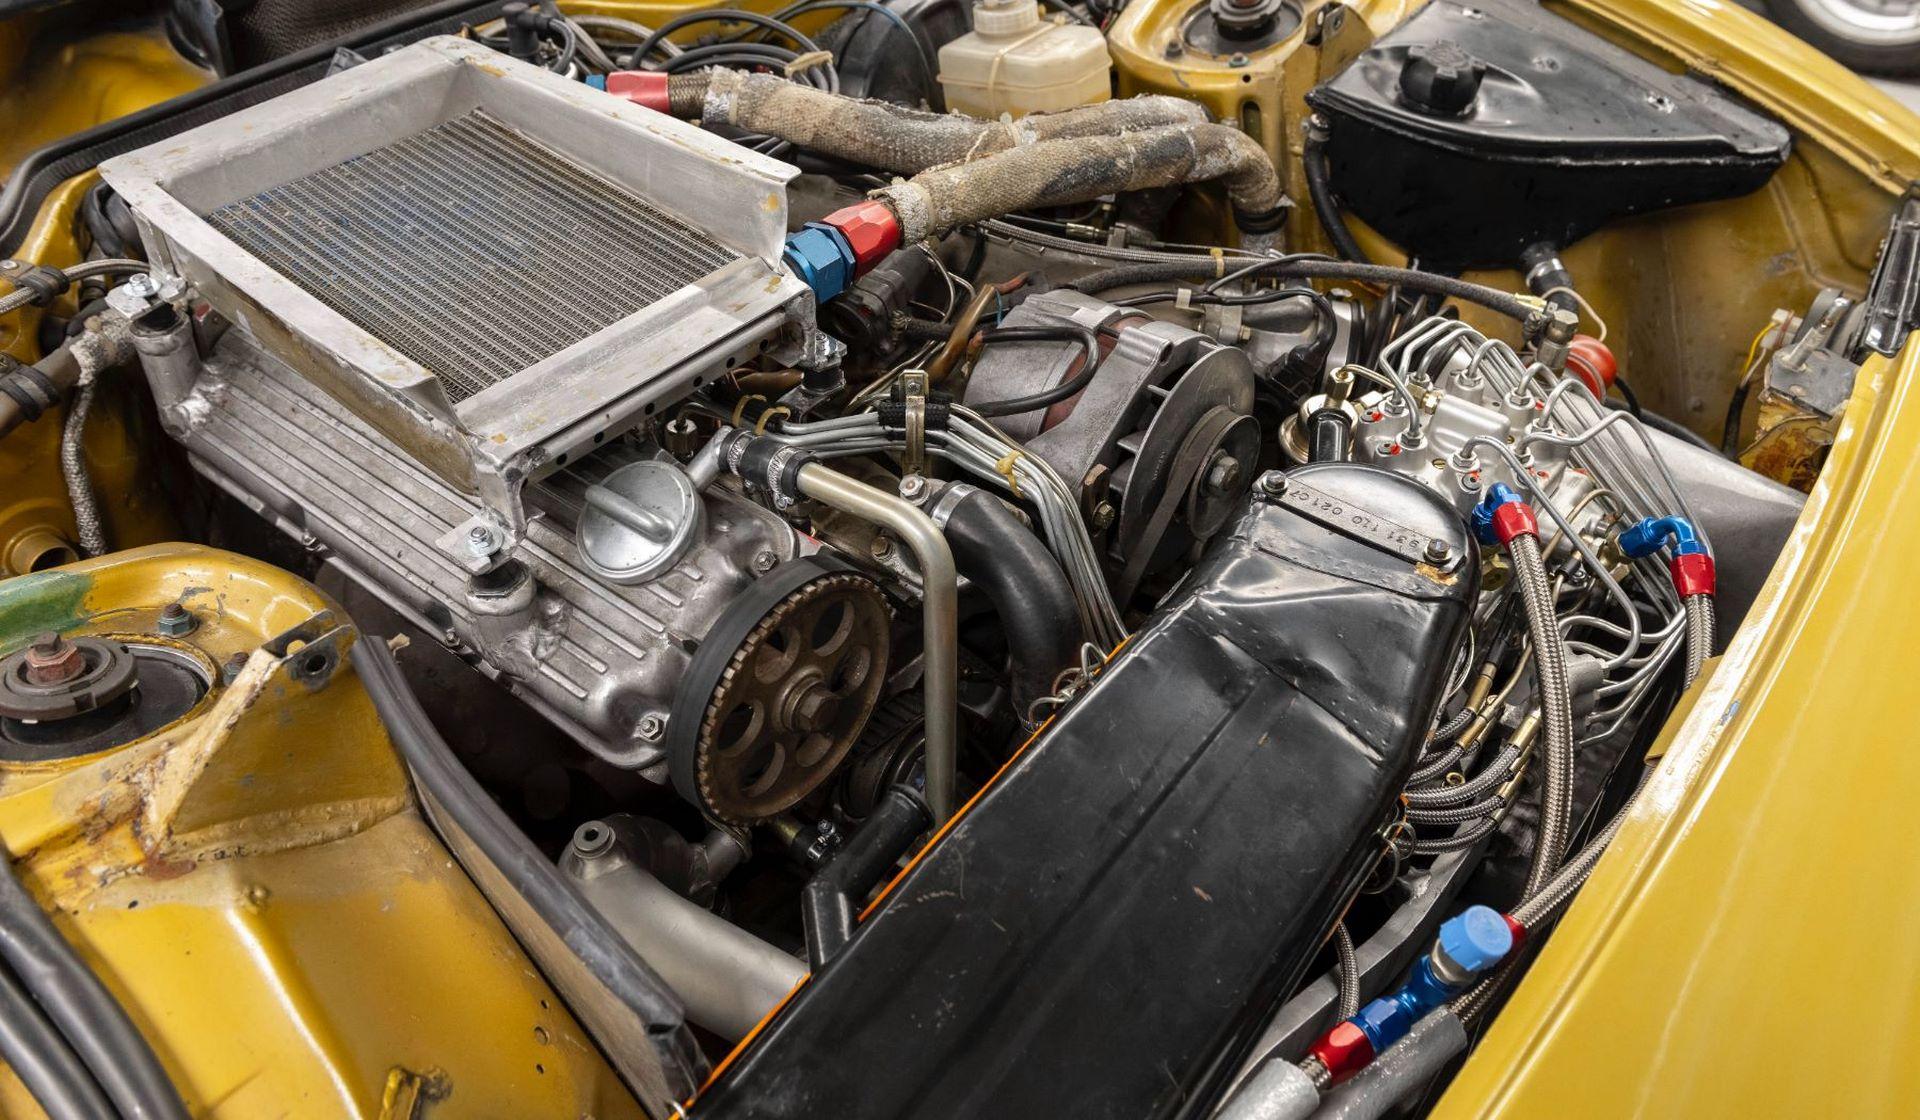 Porsche-924-Carrera-GTS-rally-car-Walter-Rohrl-29